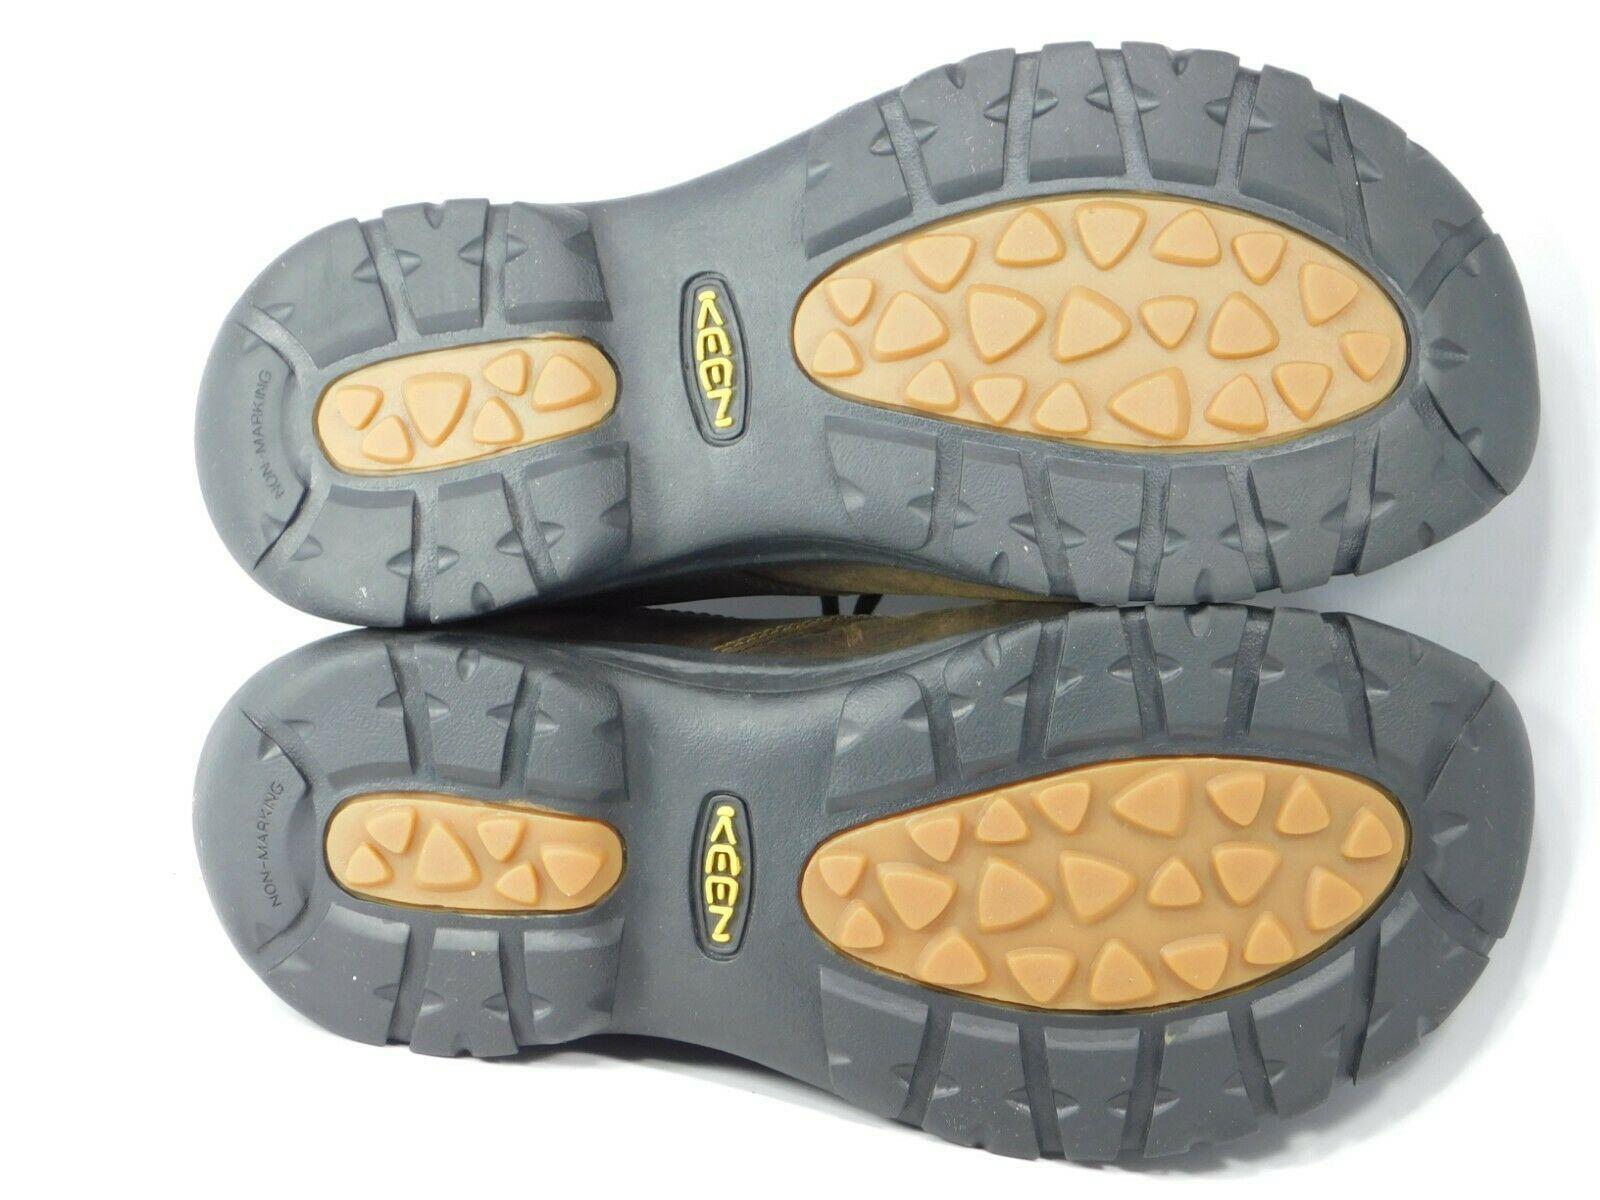 Keen Boston III Size 11.5 M (D) EU 45 Men's Lace Up Casual Shoes Brown 1015043